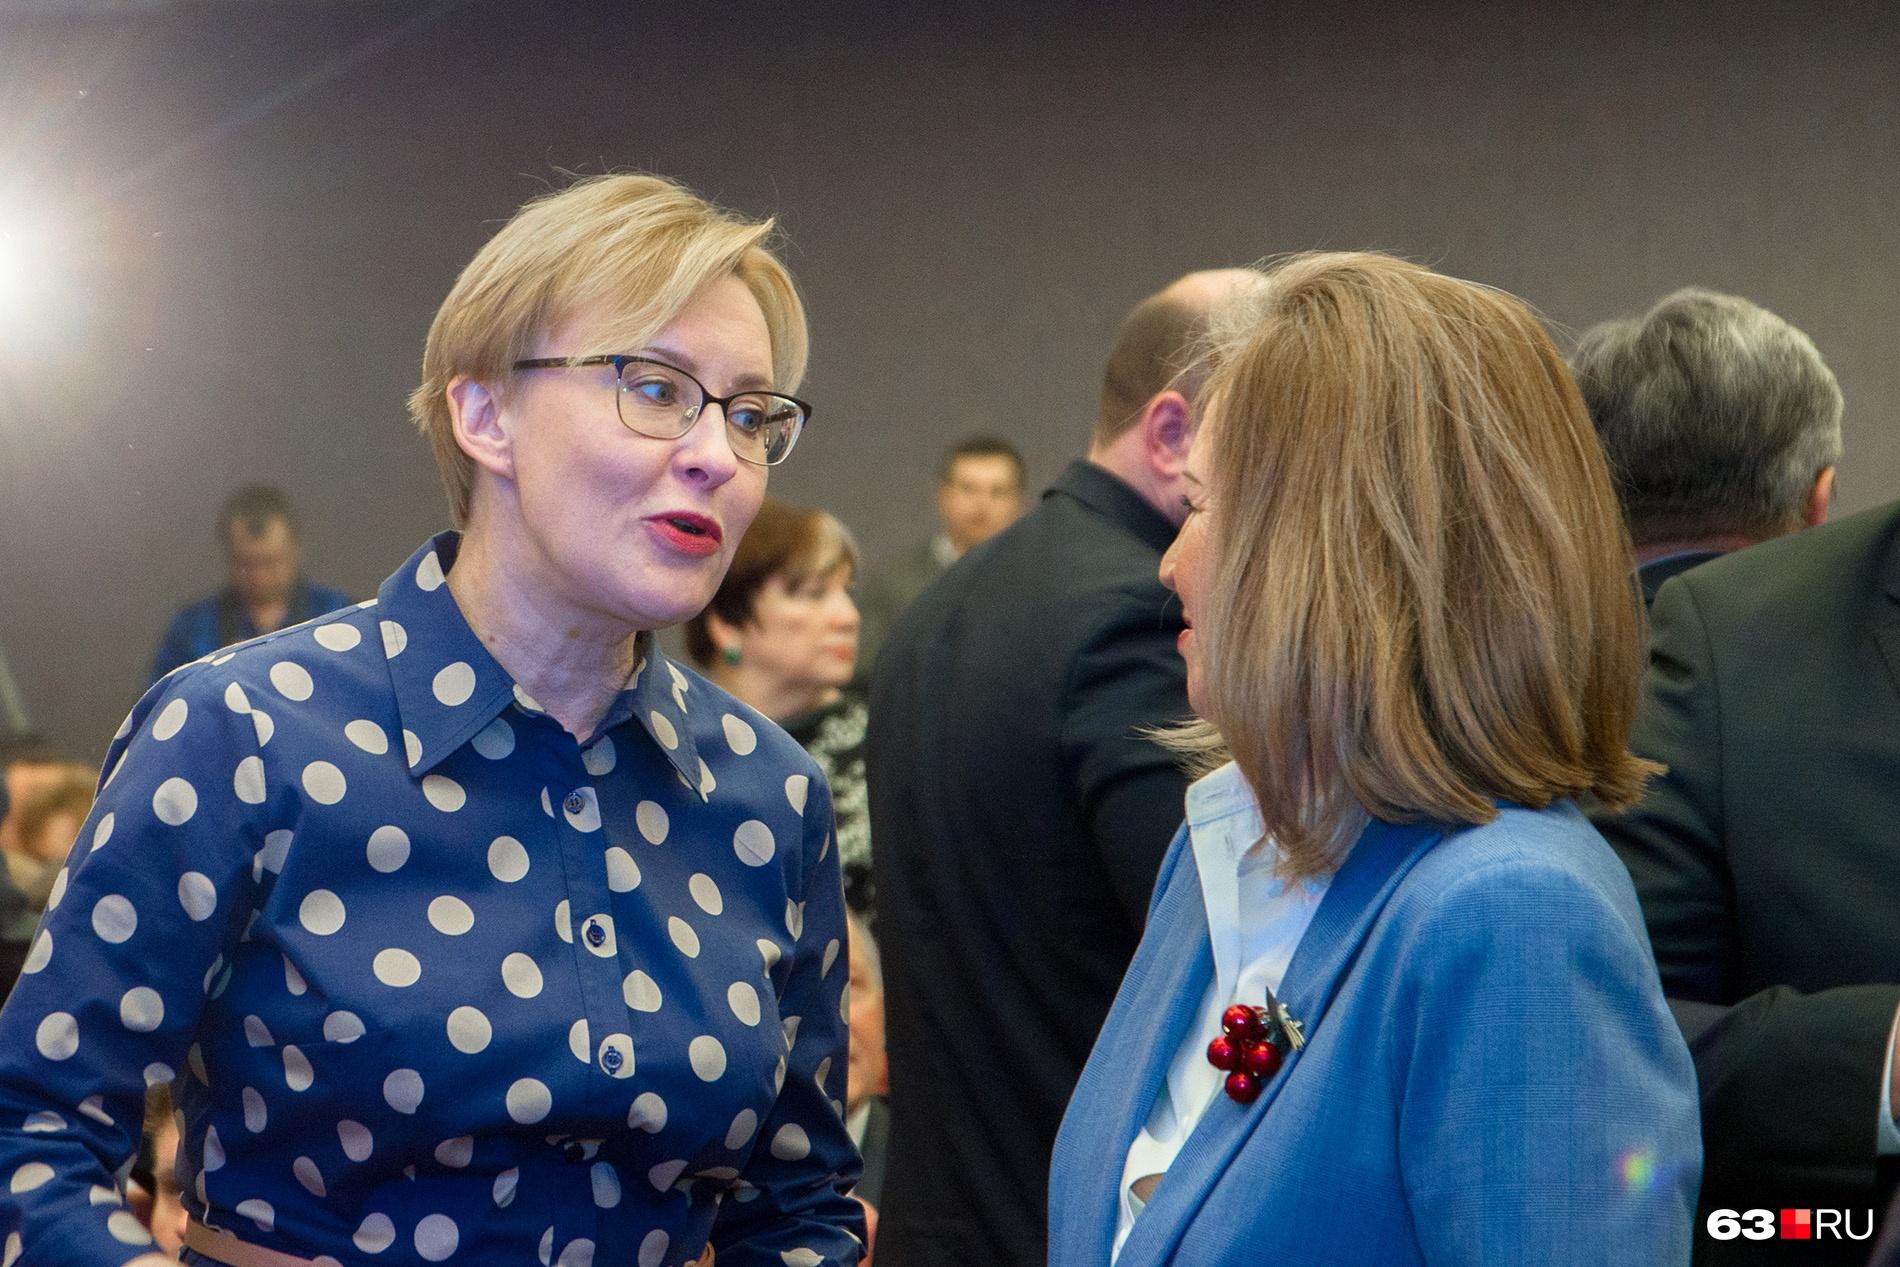 "Когда Елена Лапушкина стала мэром, она <a href=""https://63.ru/text/politics/53311571/"" target=""_blank"" class=""_"">обещала навести</a> порядок в сфере ЖКХ"